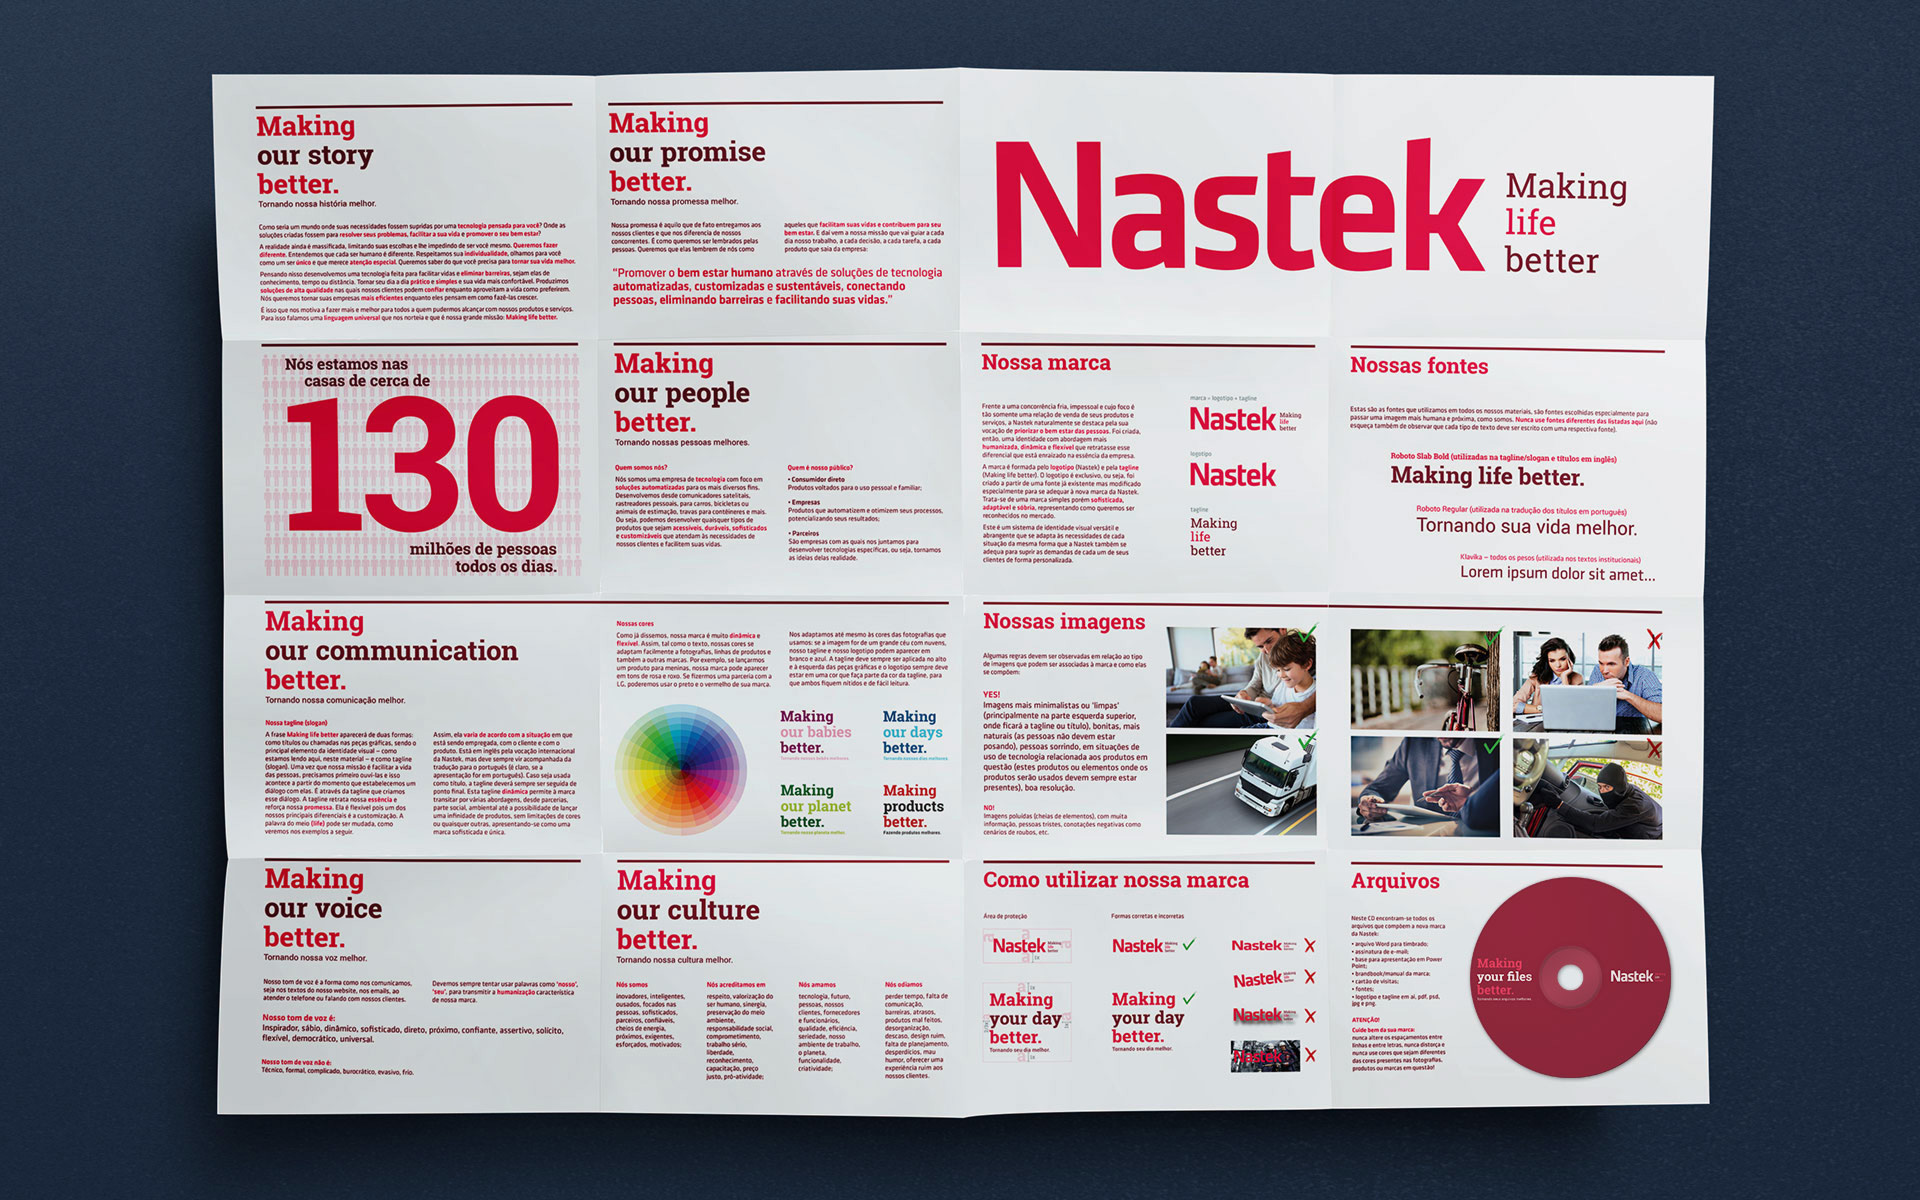 Case Nastek Imagem 2